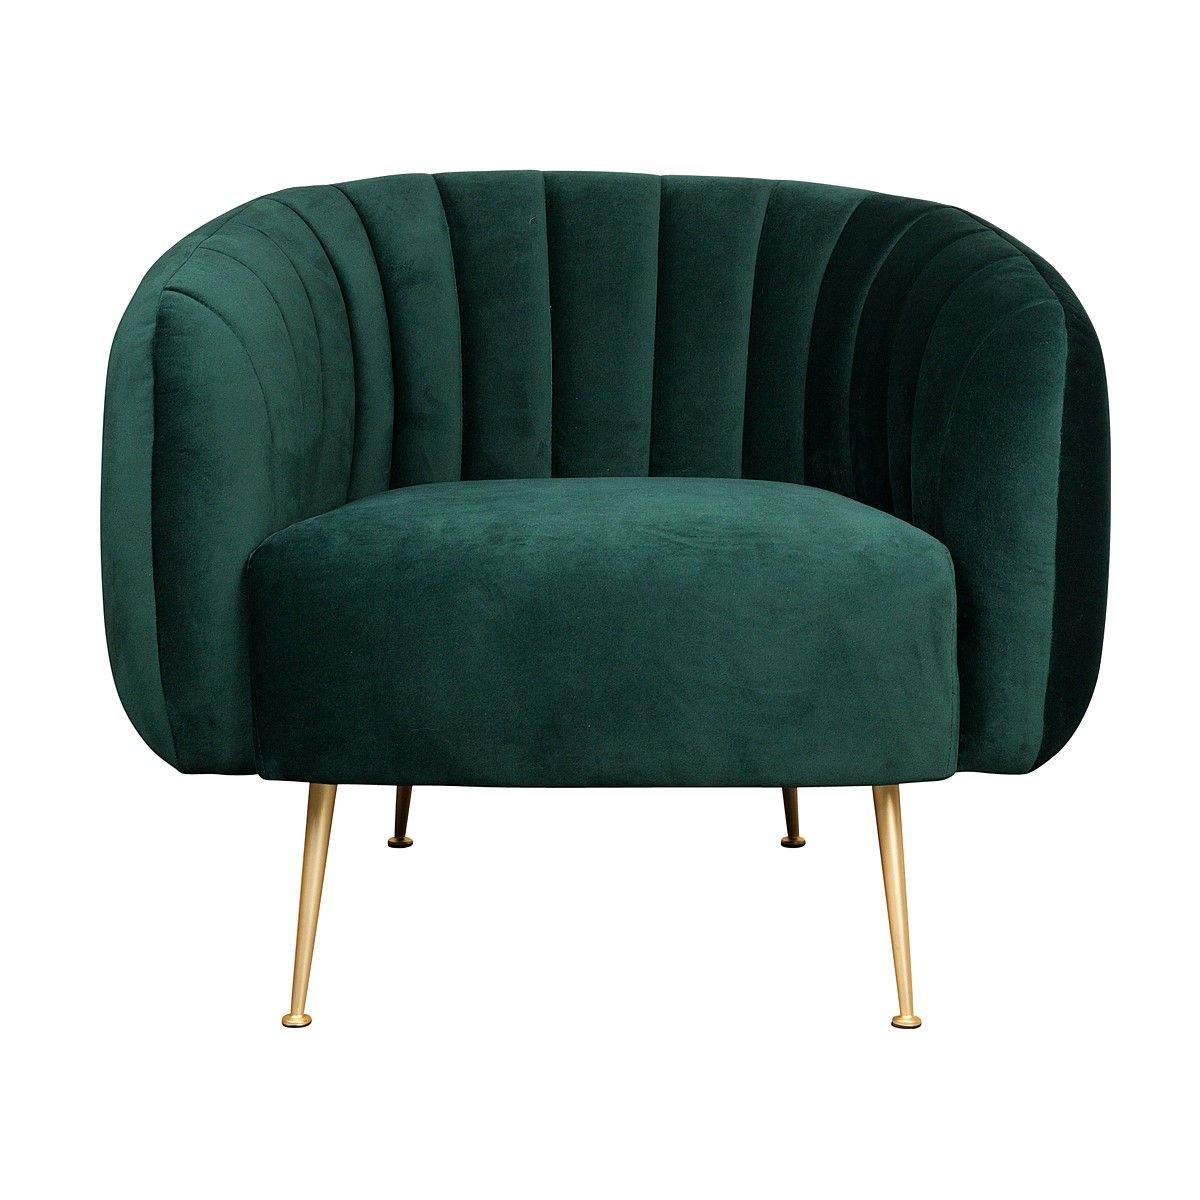 Occasional Chairs Living Furniture Nood Nz Farrah Armchair